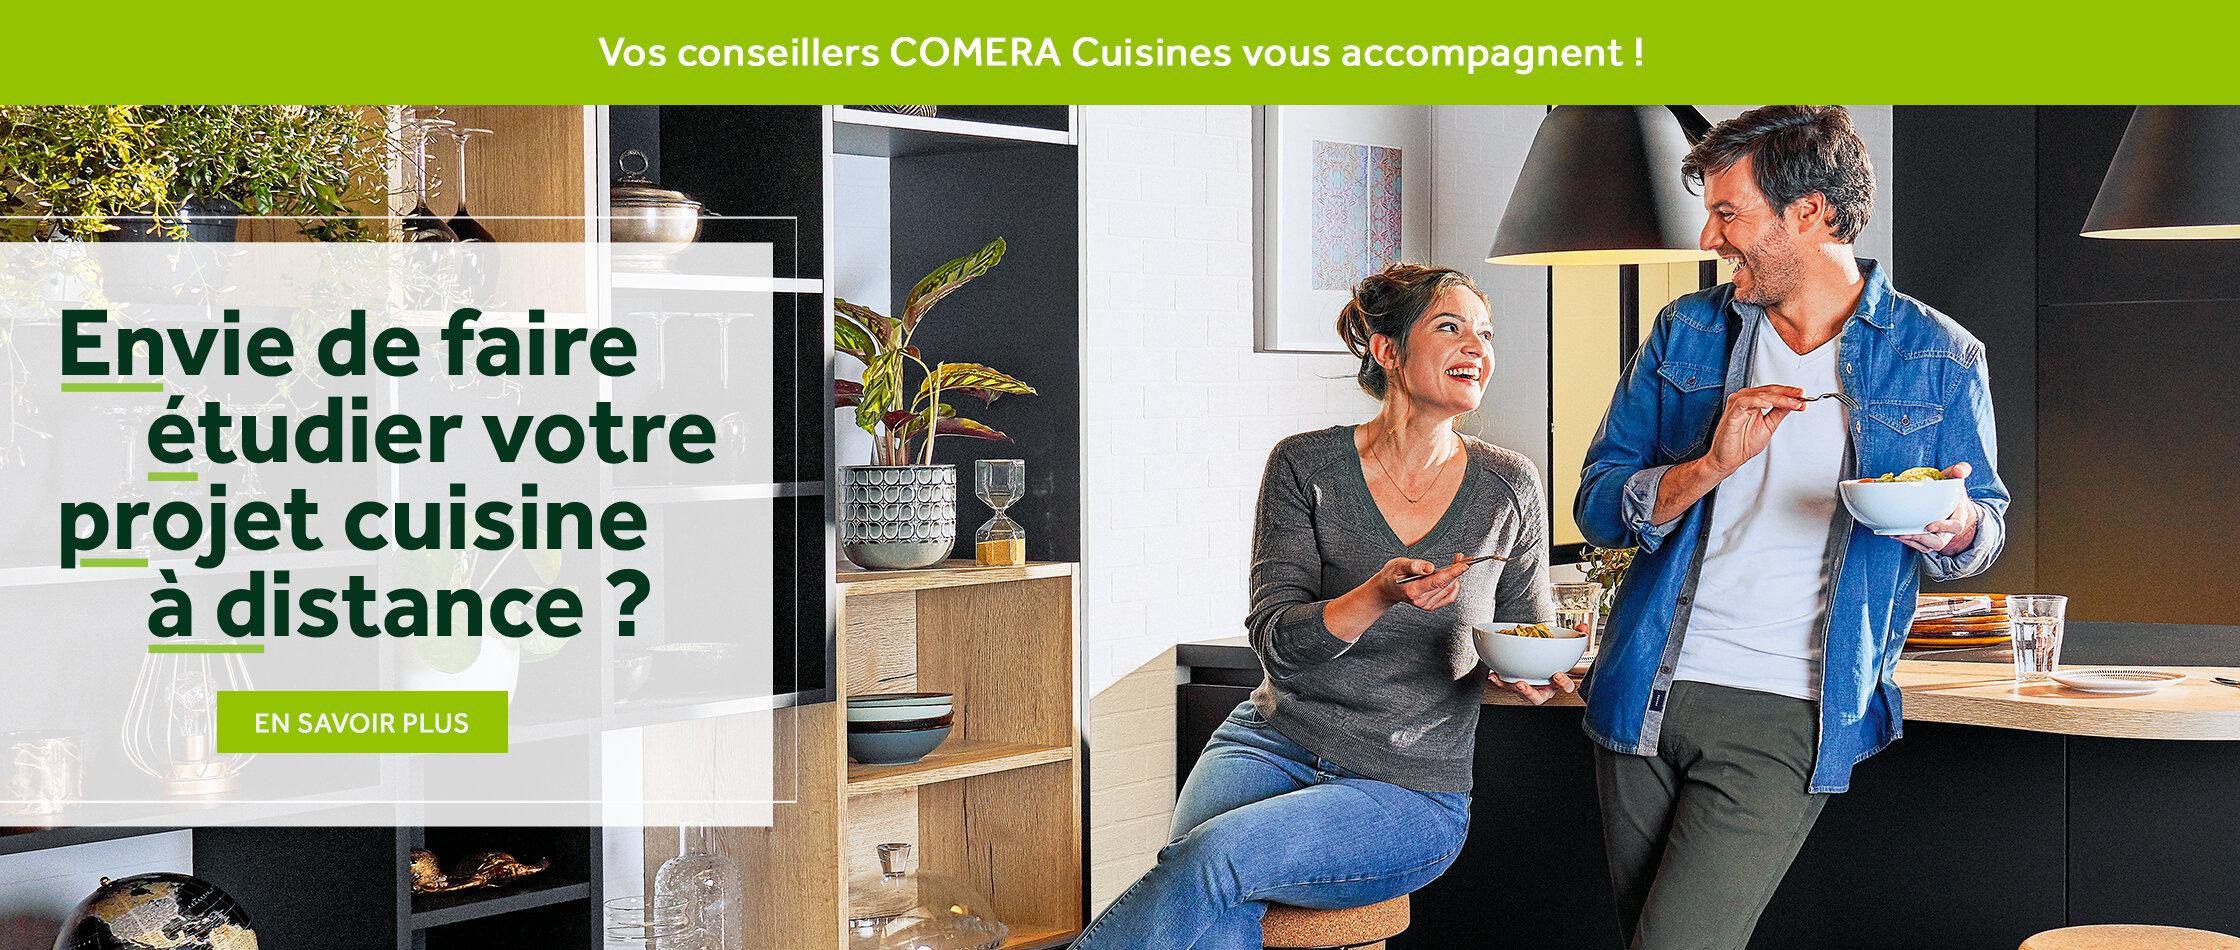 projet-cuisines-amenagees-distance-comera-cuisines